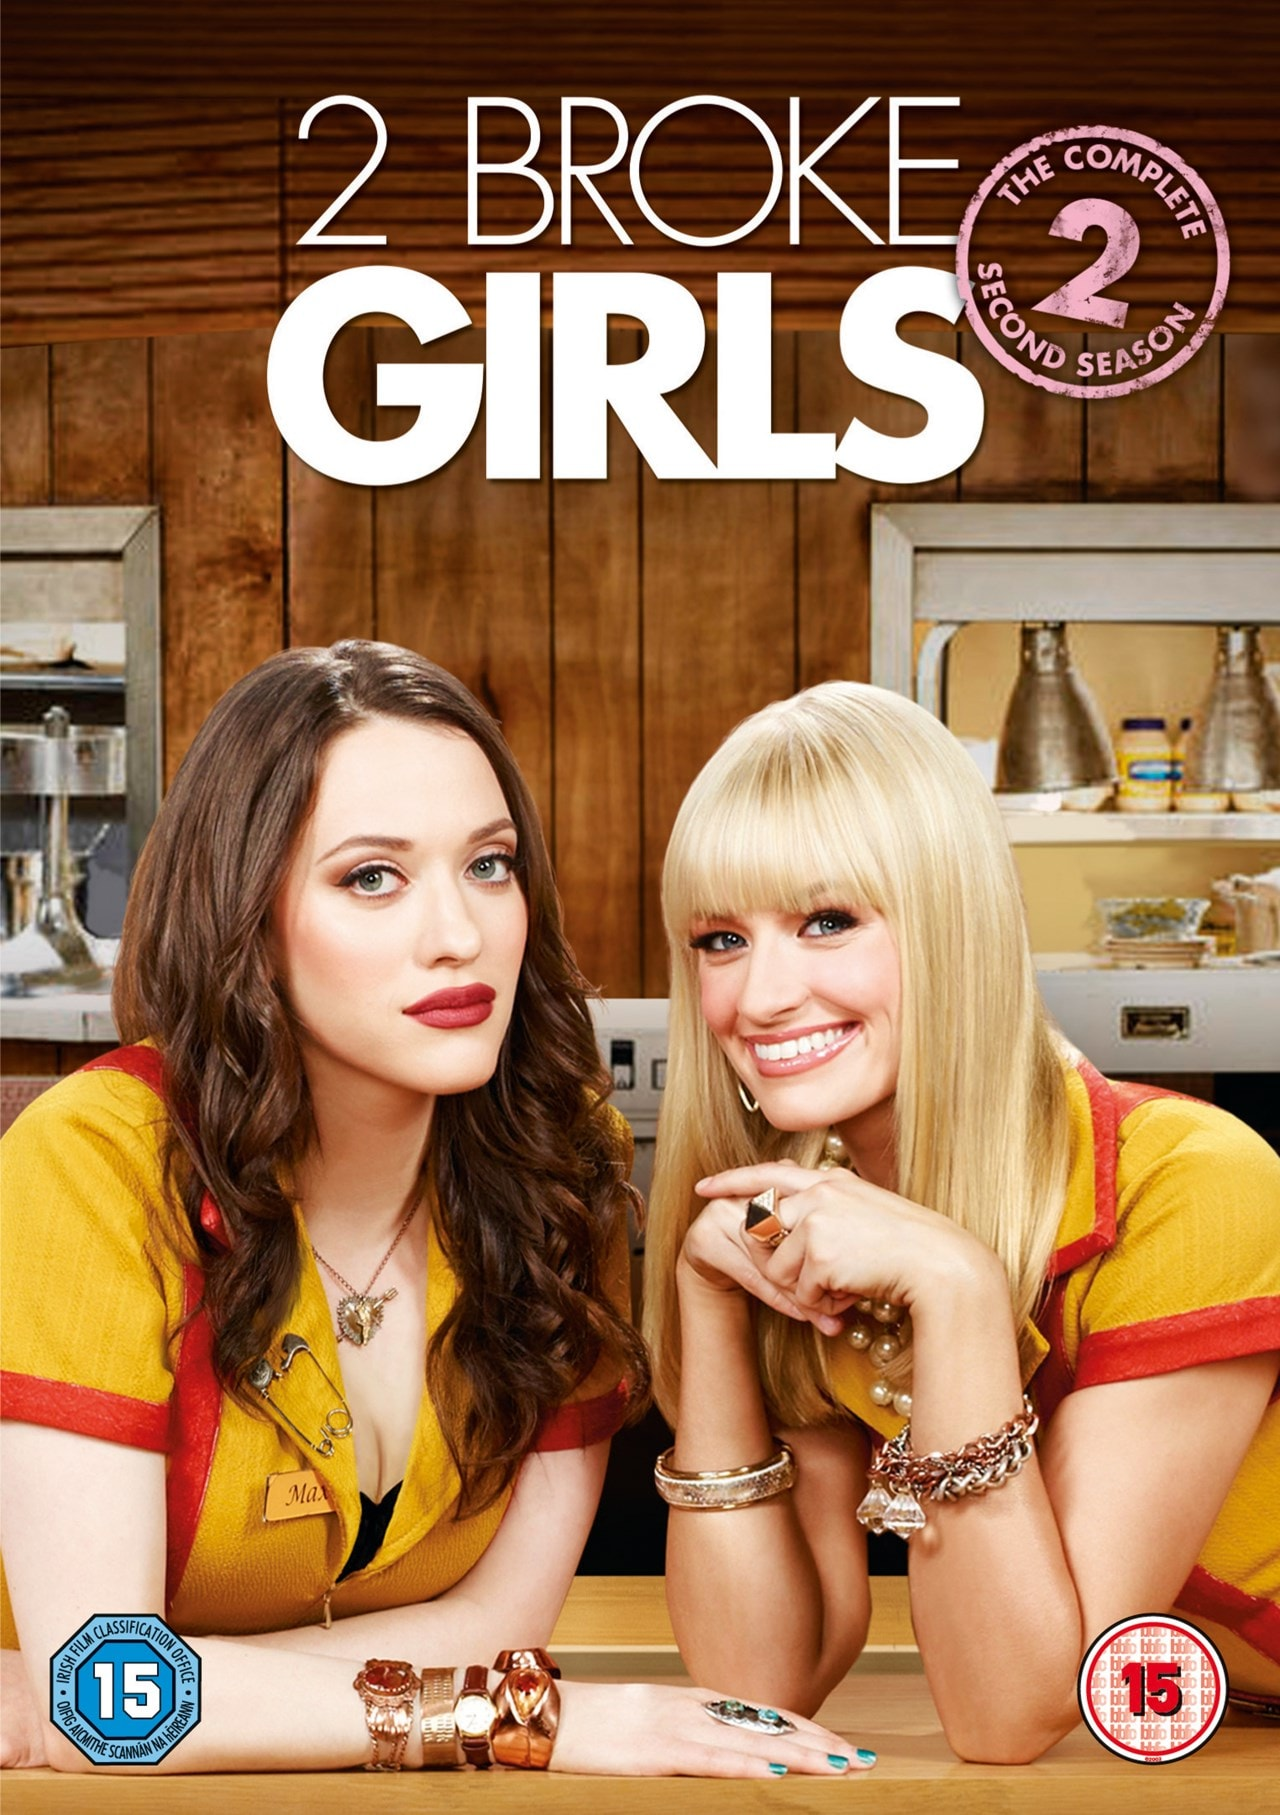 2 Broke Girls: The Complete Second Season - 1